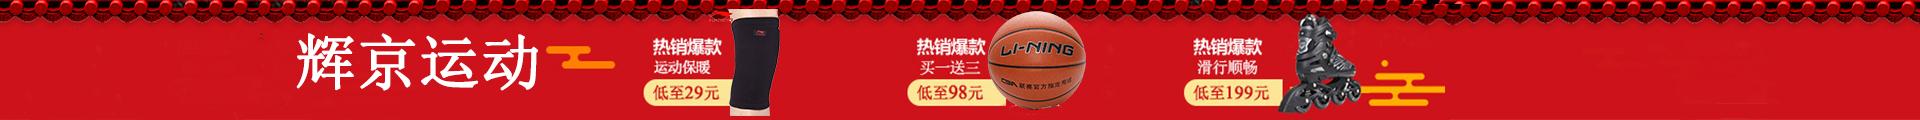 http://image.suning.cn/uimg/sop/commodity/214569455422667892874070_x.jpg